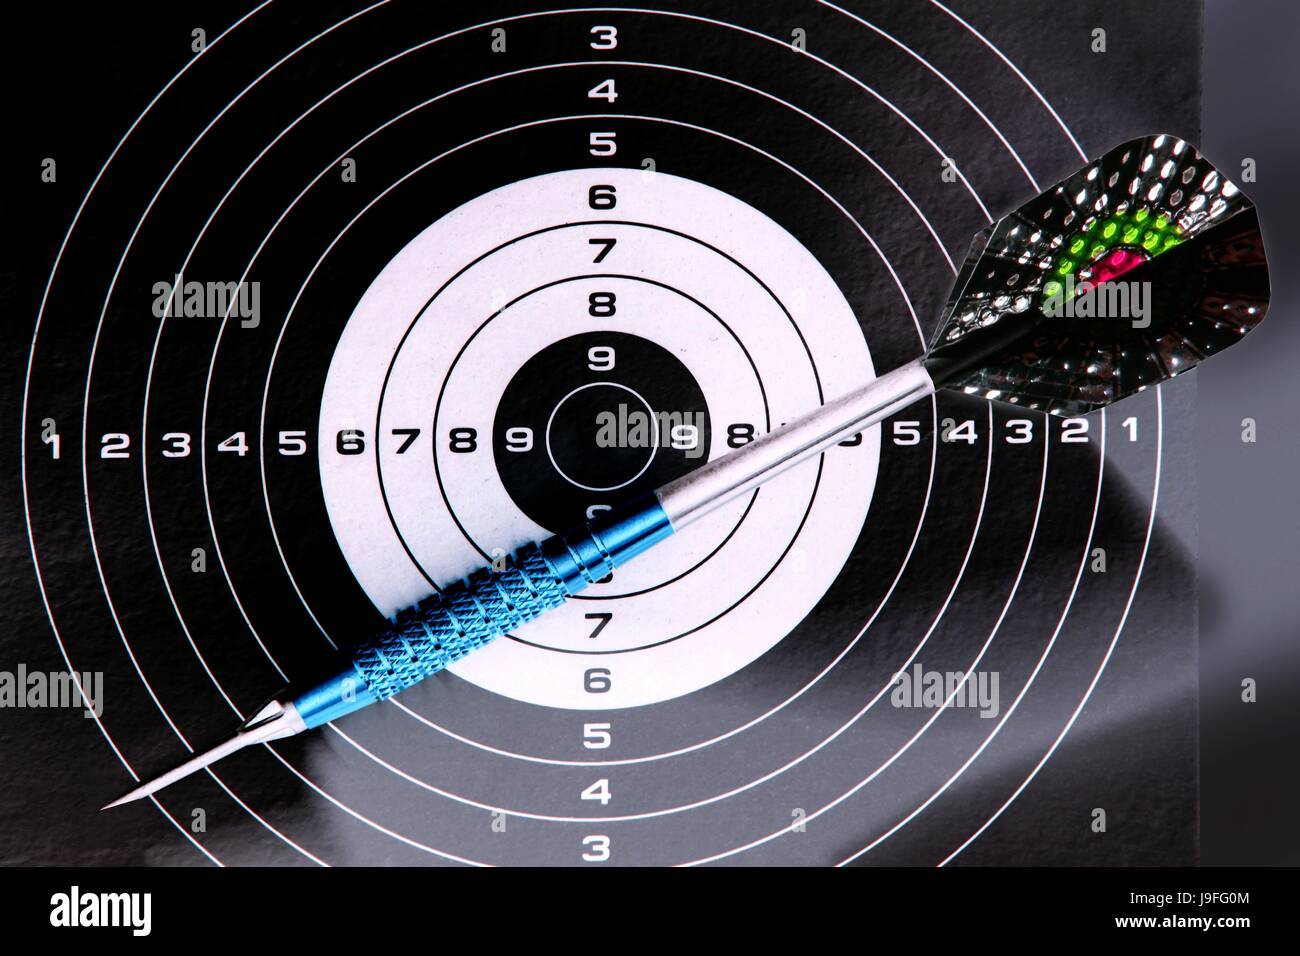 close, blue, ring, board, macro, close-up, macro admission, close up view, - Stock Image